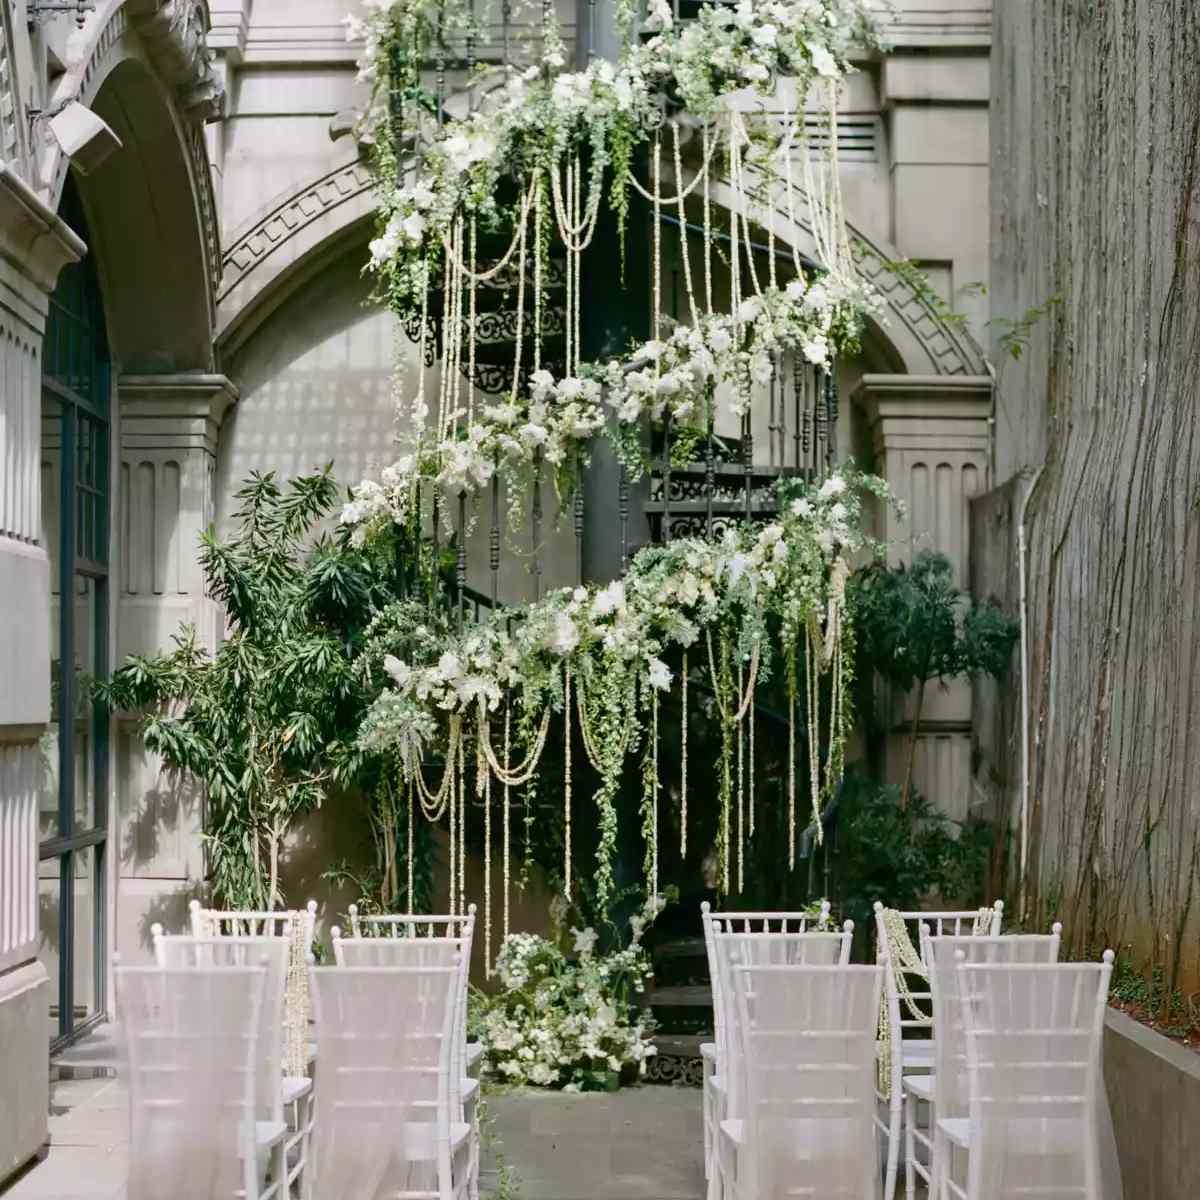 Asymmetrical hanging greenery altar